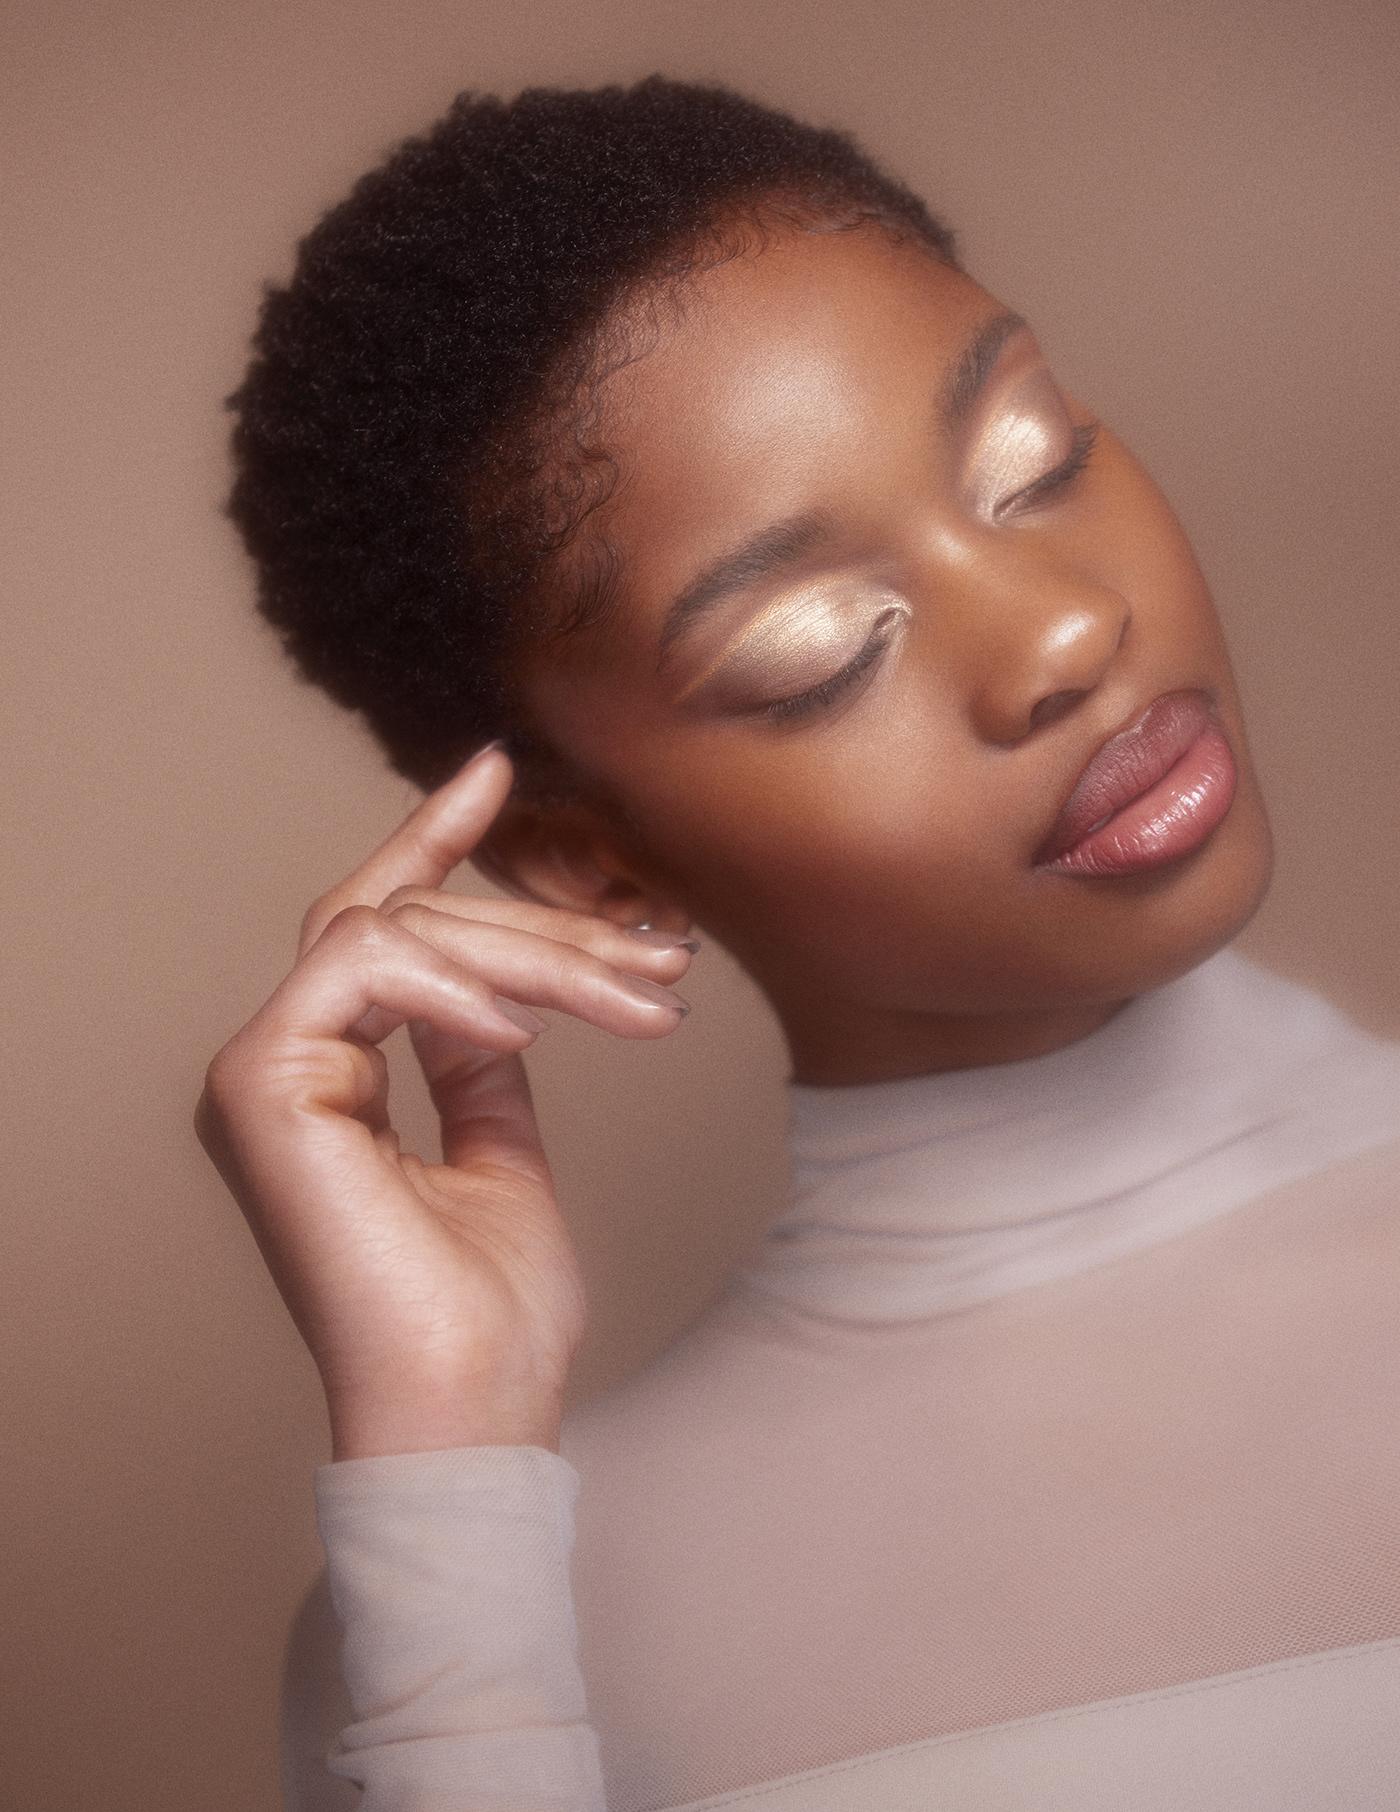 beauty beauty editorial beauty photo beauty photography beauty retoucher beauty shoot Marina Dean-francis natural retouch retouching  skin retouch